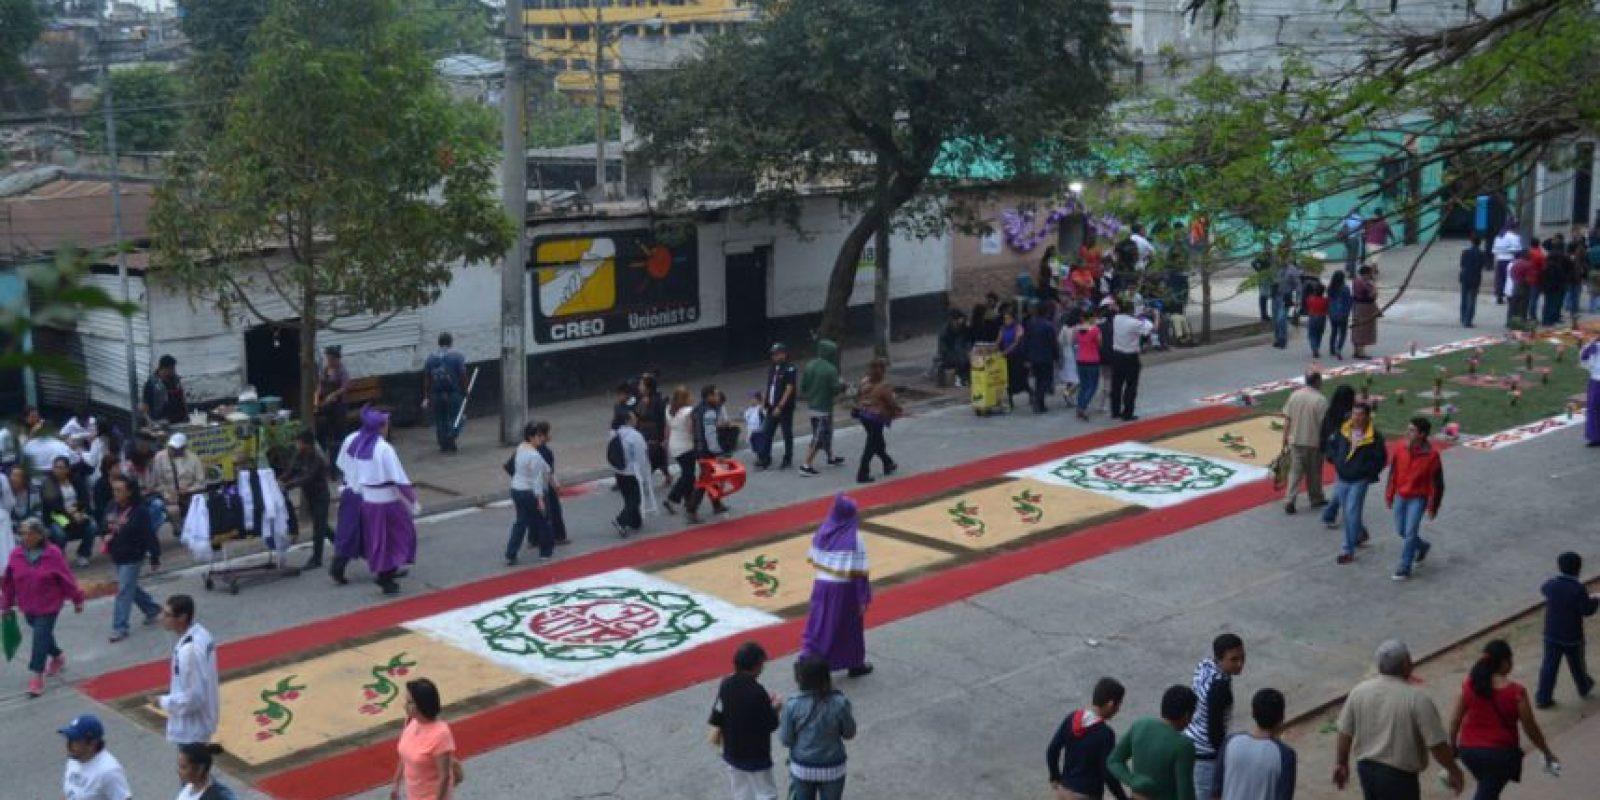 Foto:Marvin del Cid / Emisoras Unidas